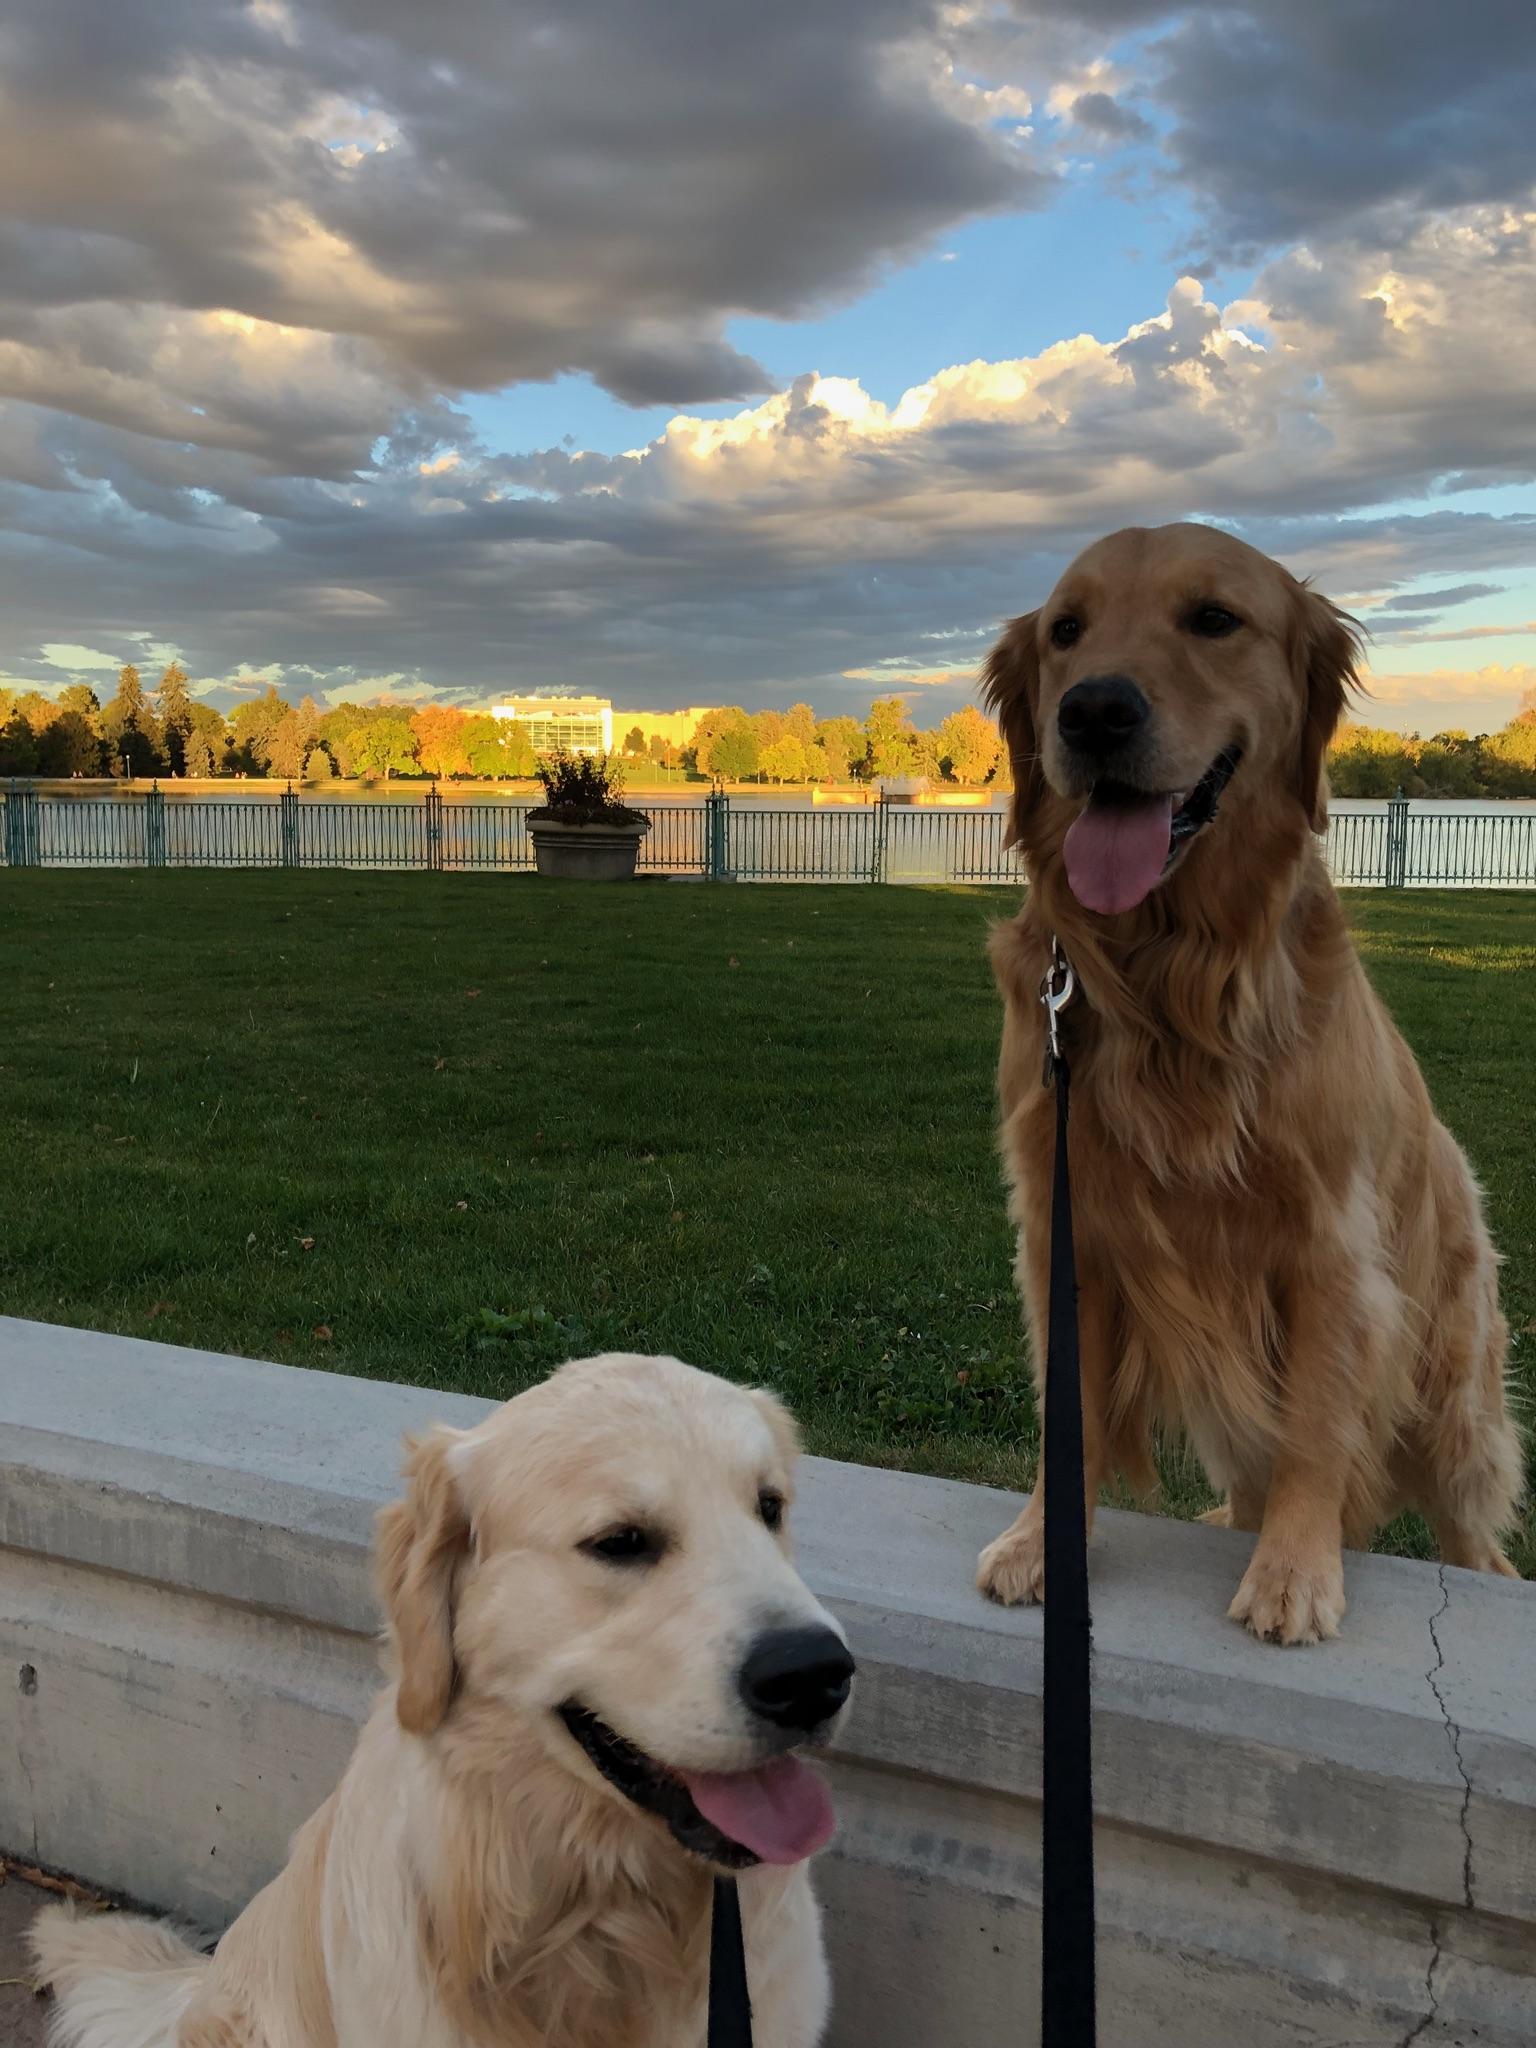 Two golden retrievers on leash // Dog Walking, Denver, CO